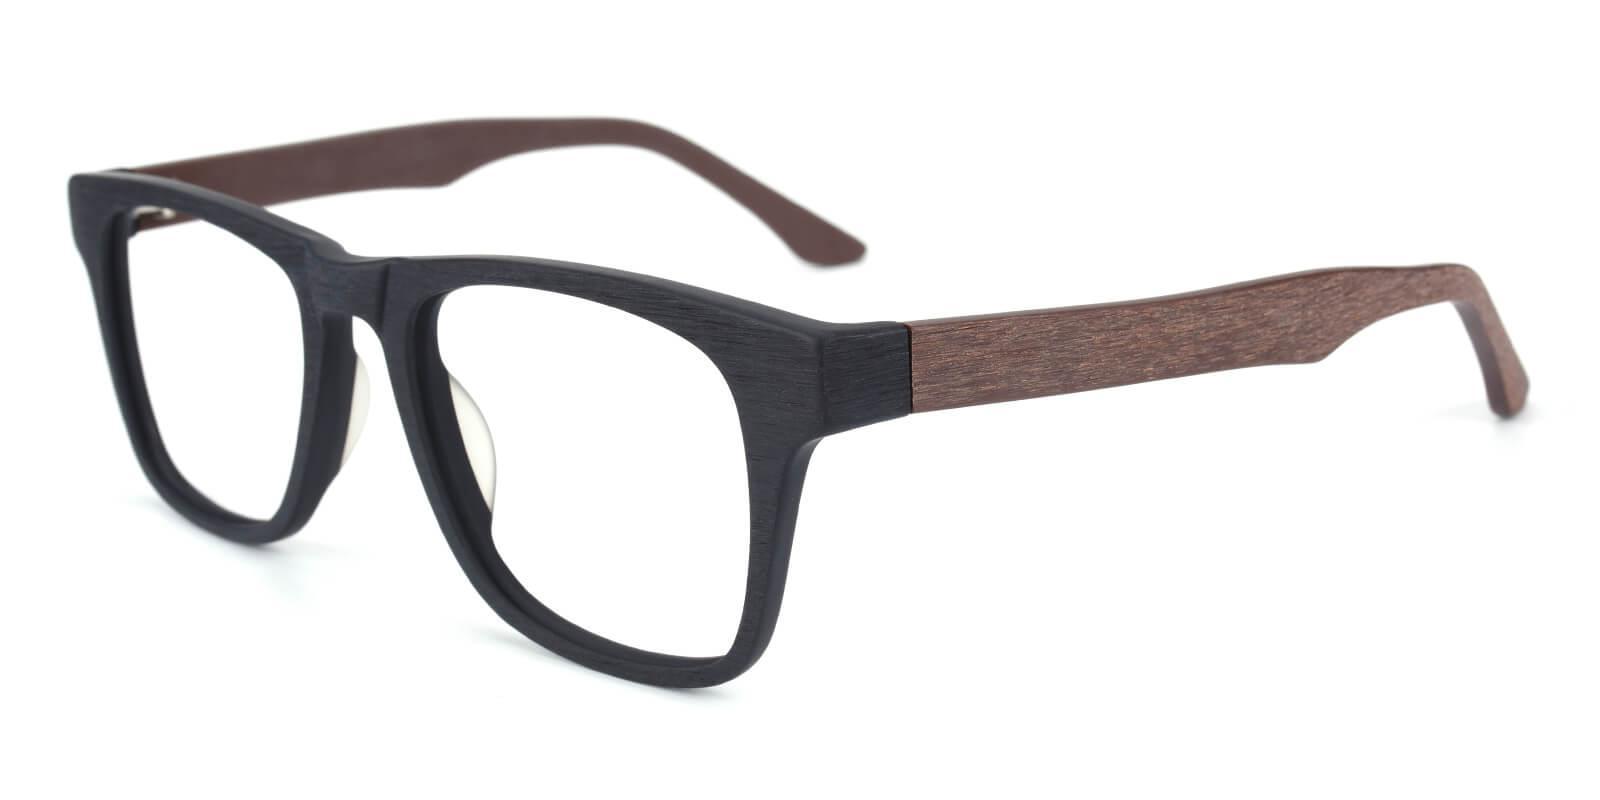 Nashive-Brown-Rectangle-Acetate-Eyeglasses-additional1